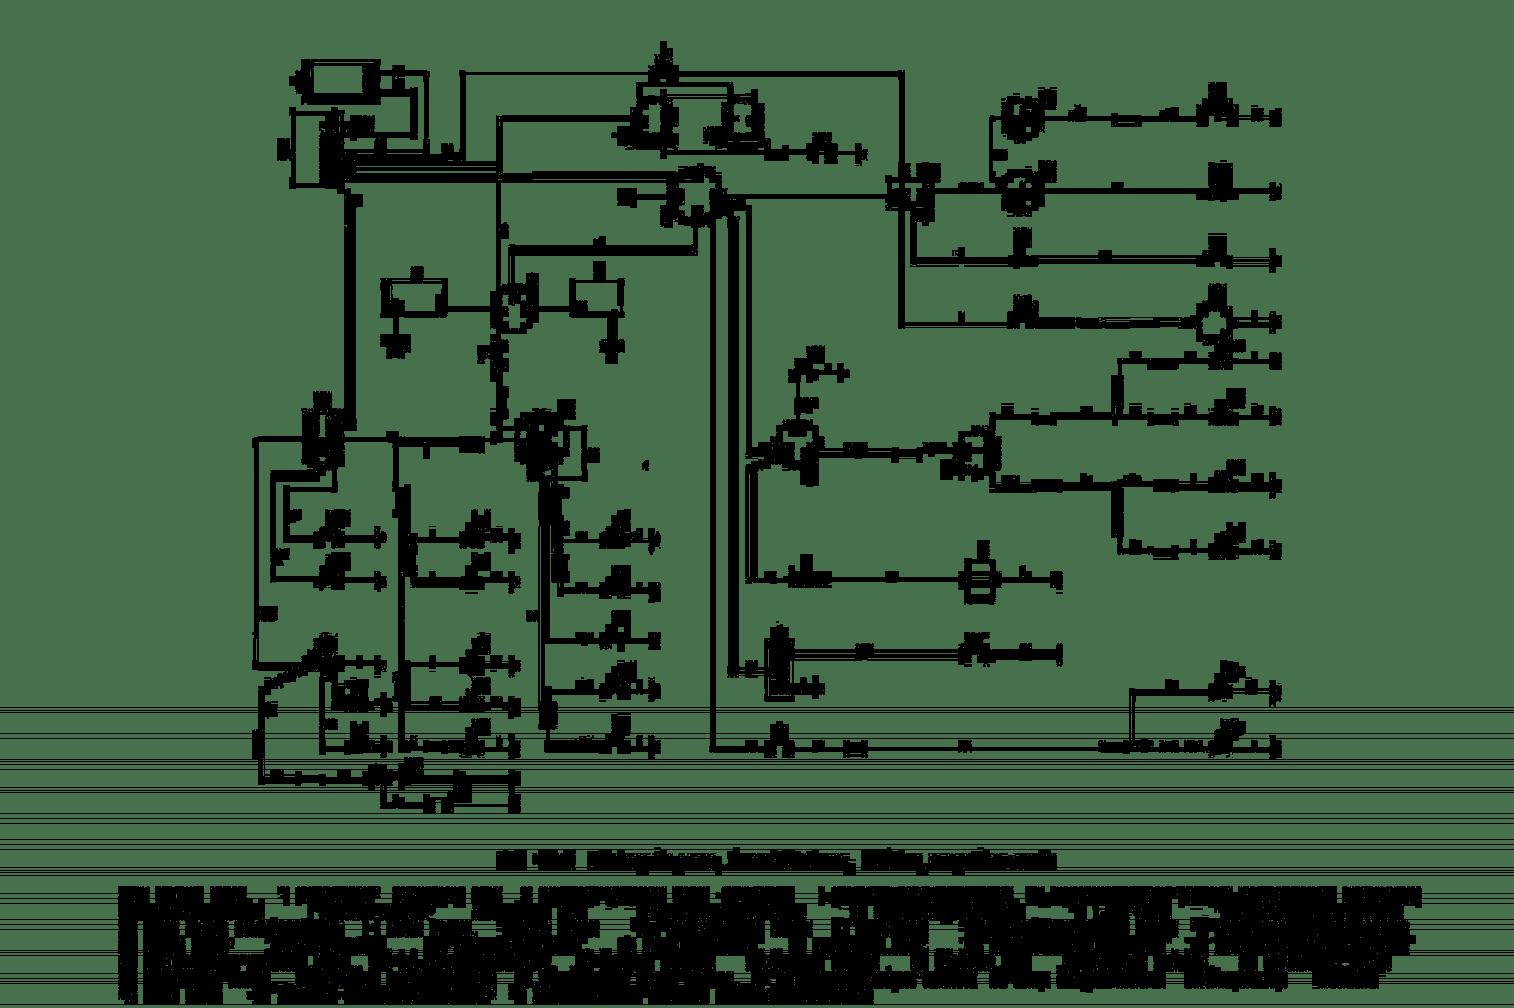 Alfa Romeo Remote Start Wiring Diagram. Alfa Romeo. Wiring Diagram on saturn starter diagram, toyota starter diagram, mini starter diagram, jeep starter diagram, ford truck starter diagram, vw starter diagram, dodge starter diagram, gmc starter diagram, mitsubishi starter diagram, camaro starter diagram,